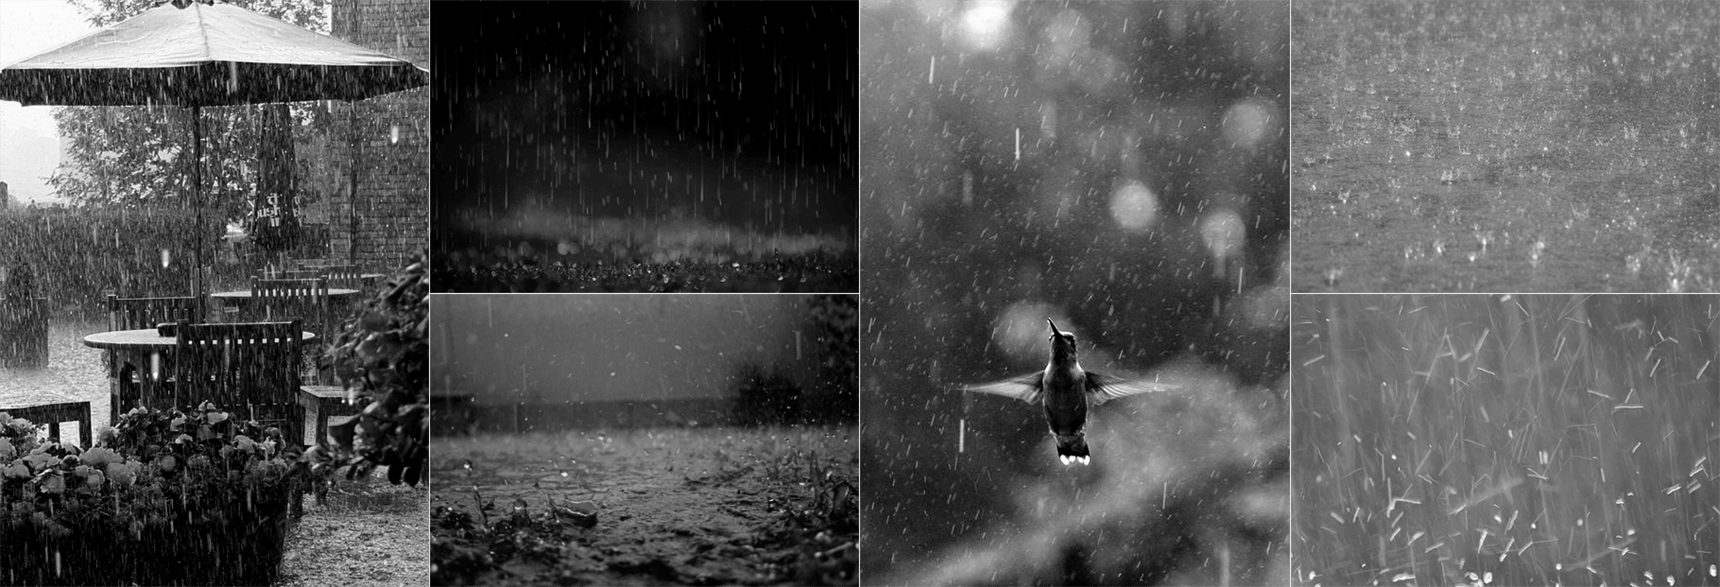 fisherman_ref_rain